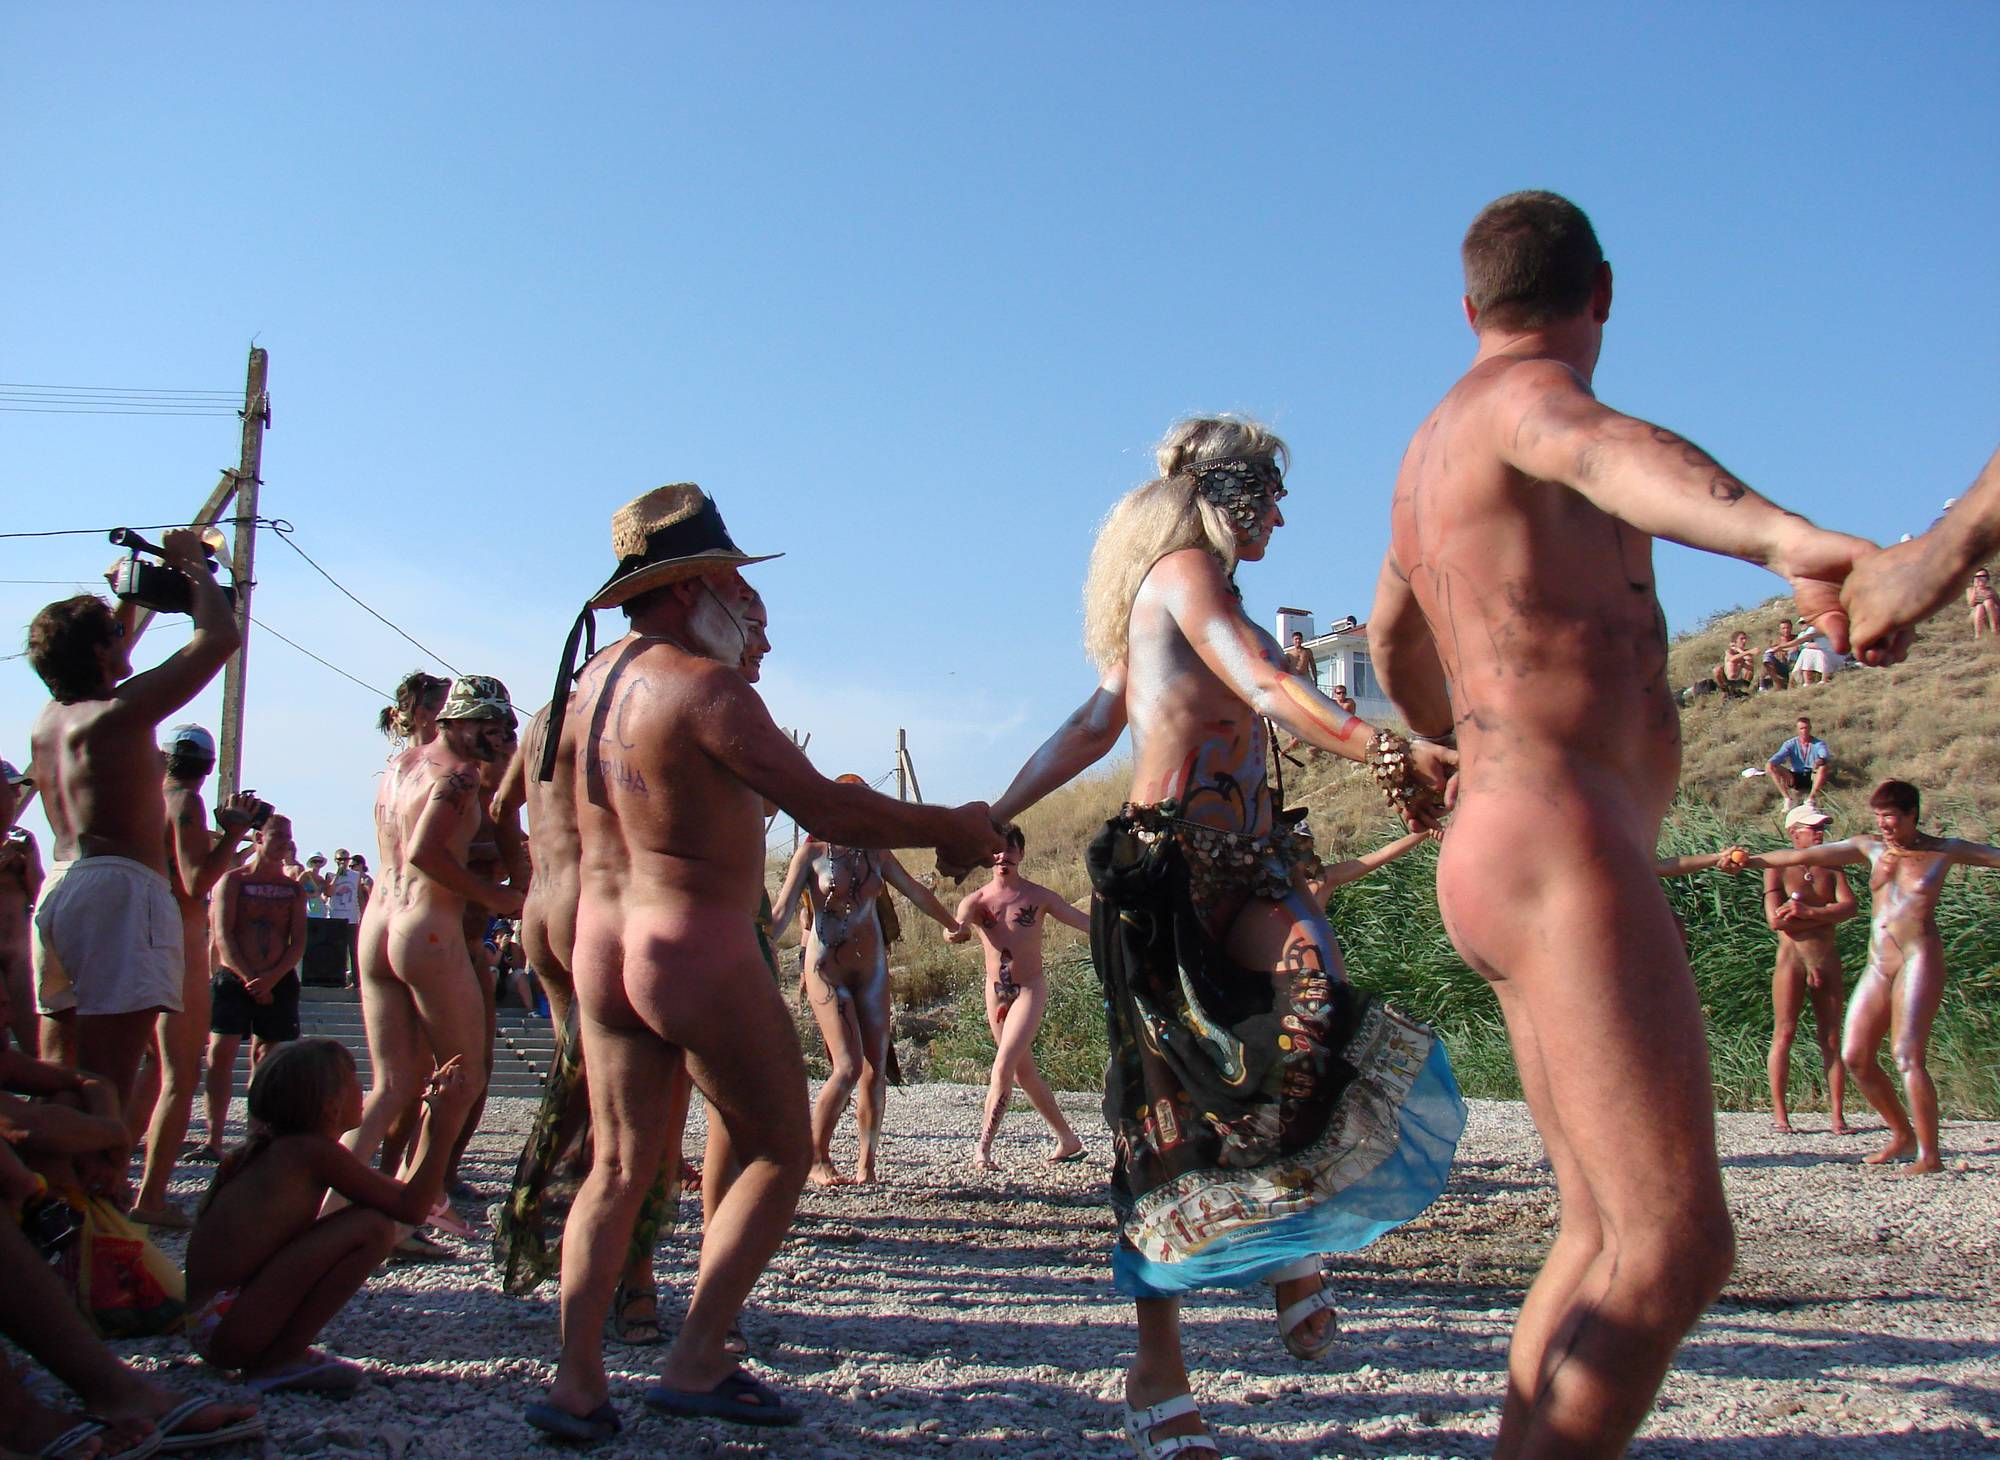 Nudist Photos Neptune Day Dance Shot - 1